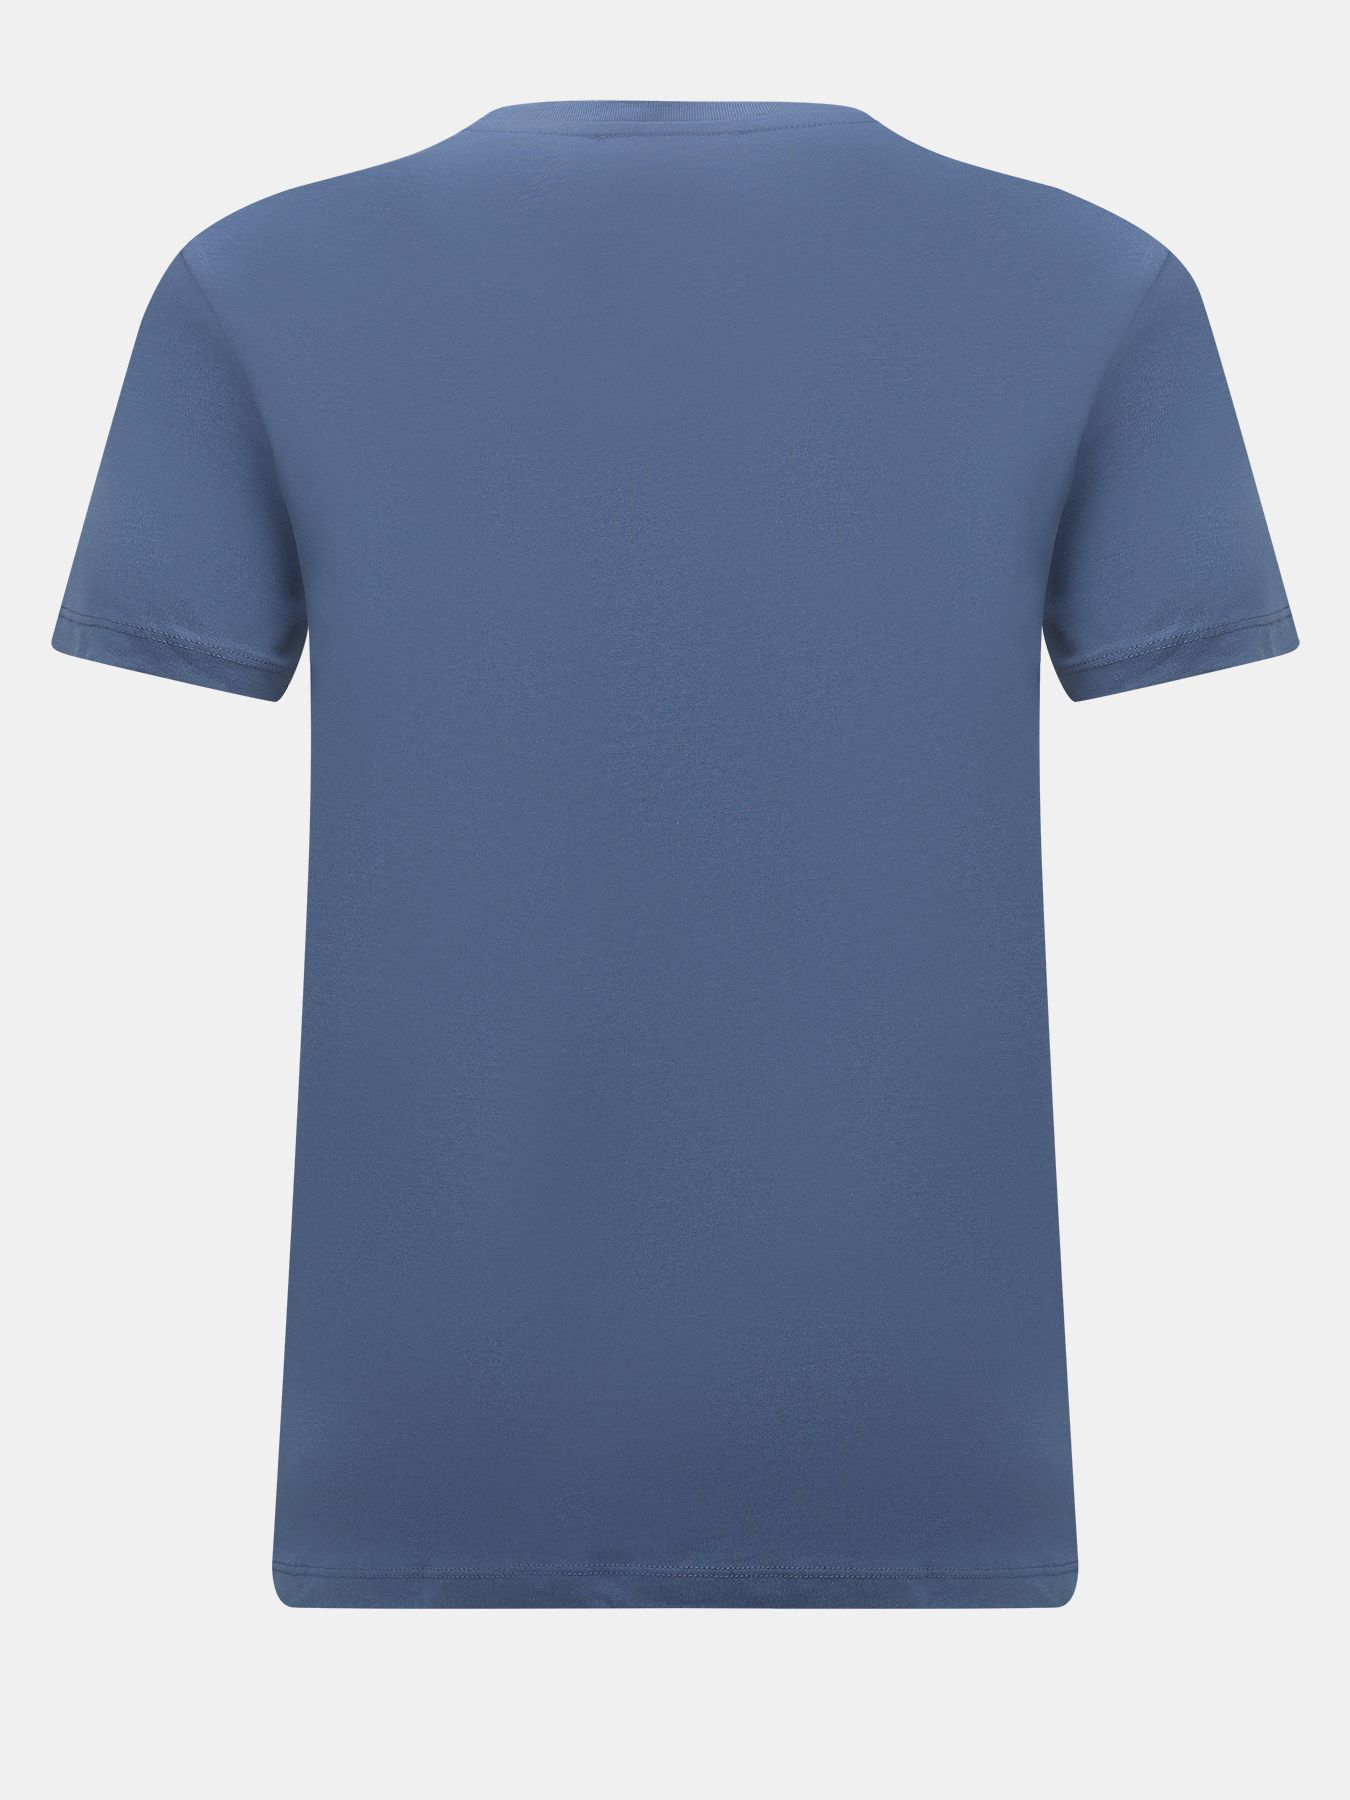 Фуфайка (футболка) Trussardi Jeans Футболка футболка trussardi jeans trussardi jeans tr016emhktz0